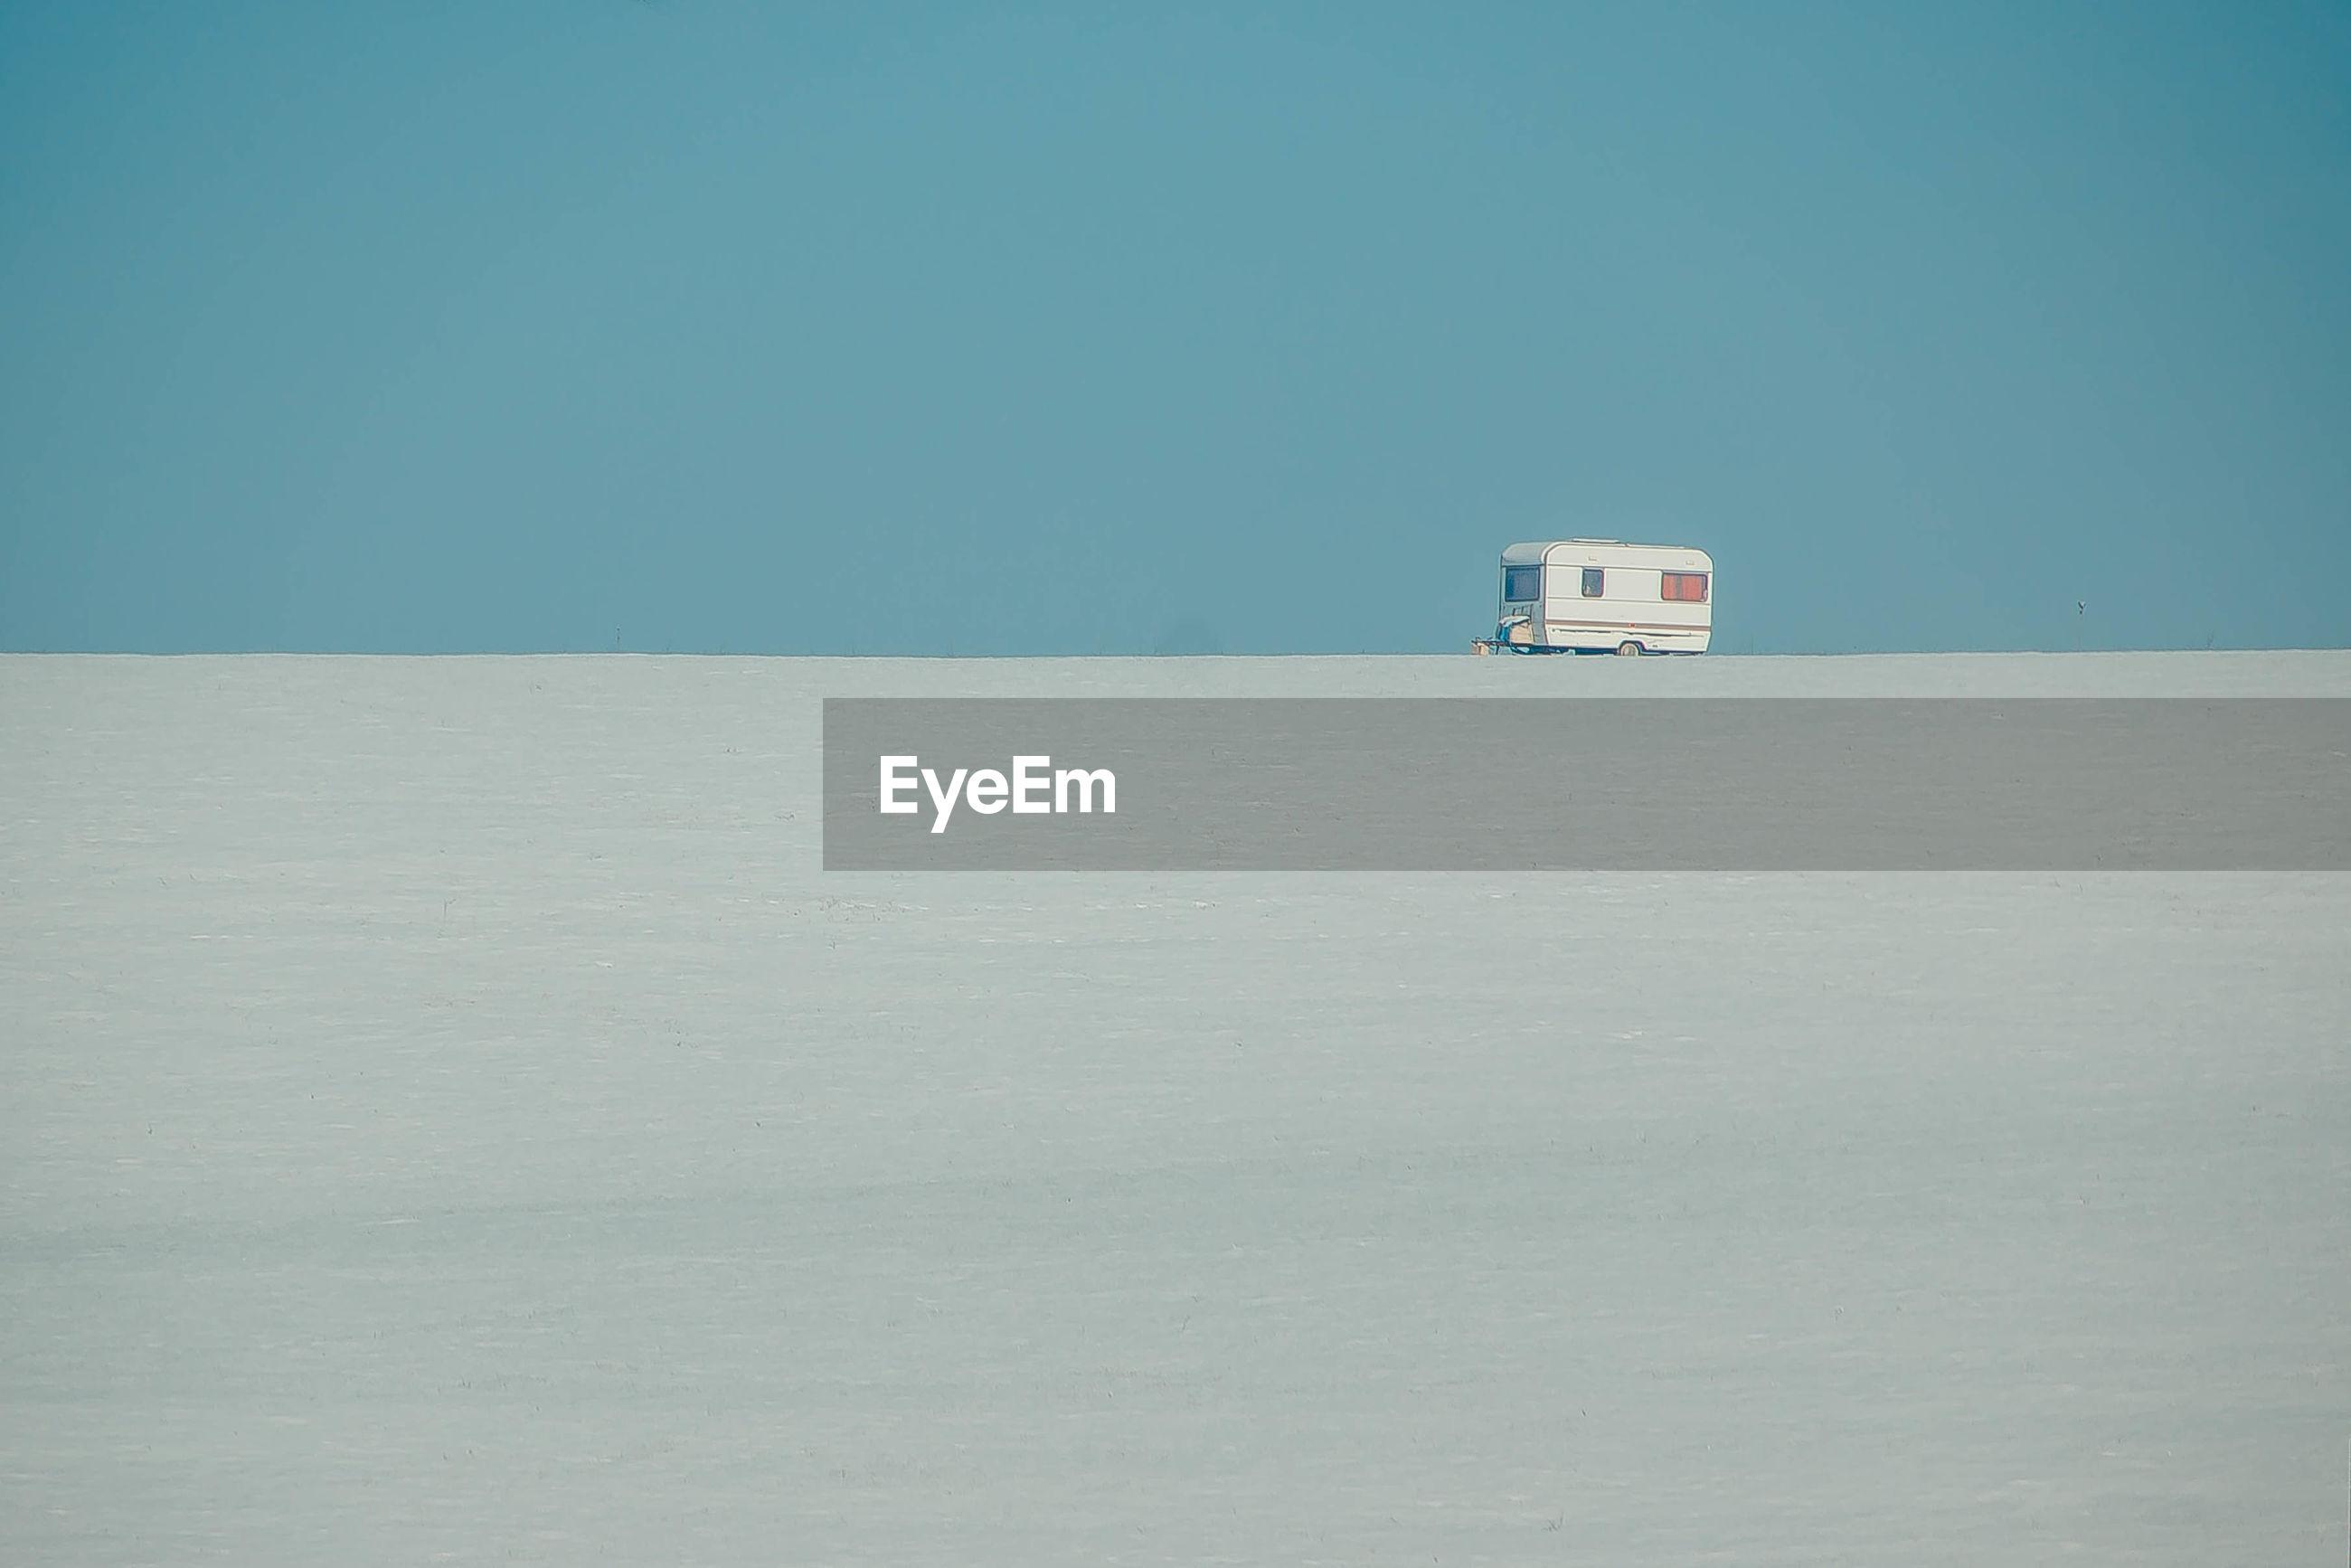 Lifeguard hut on sand against clear blue sky